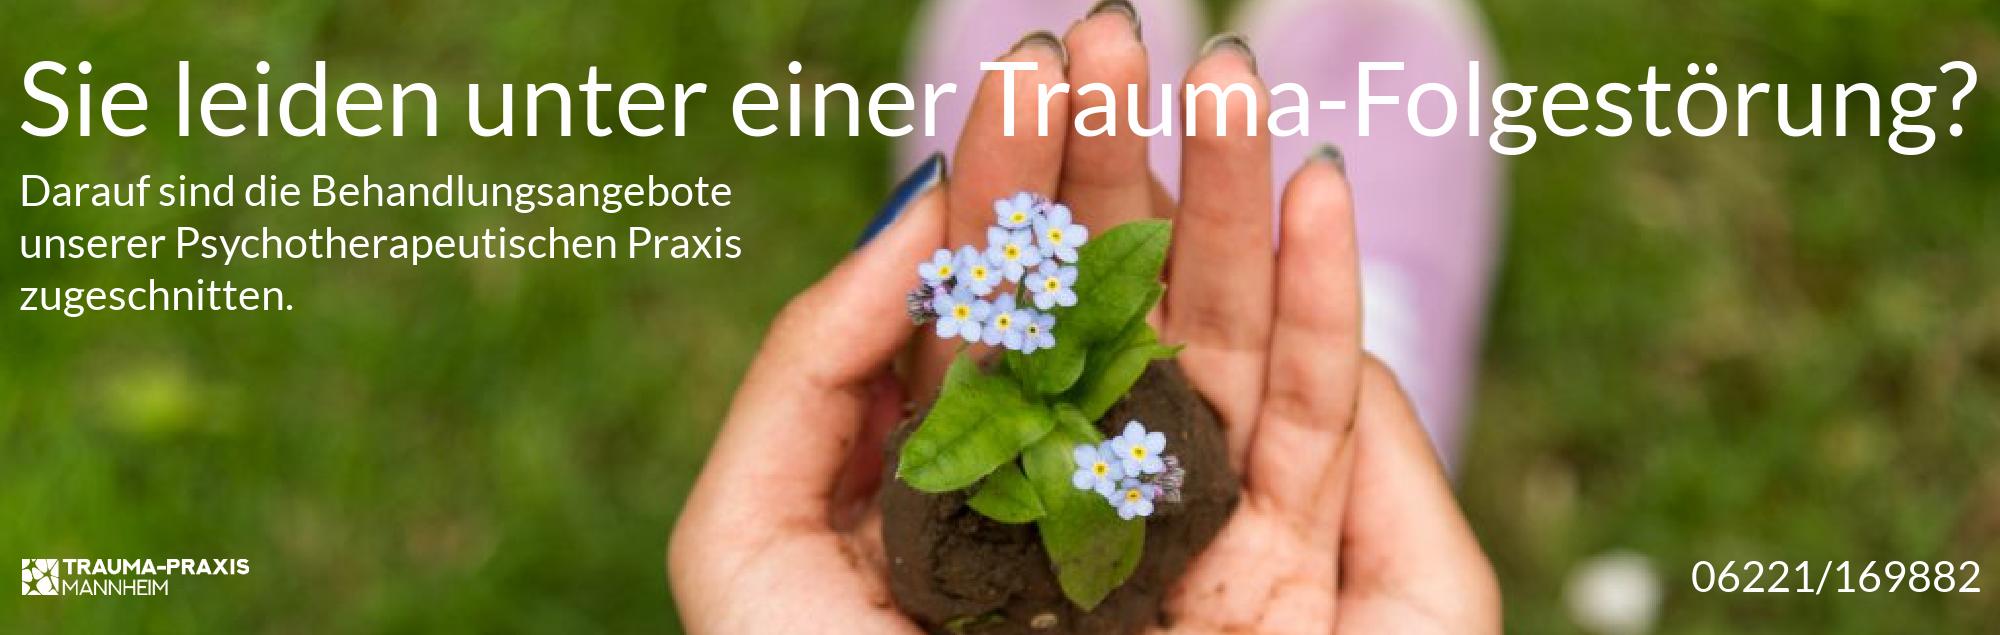 Traumatherapie in Mannheim